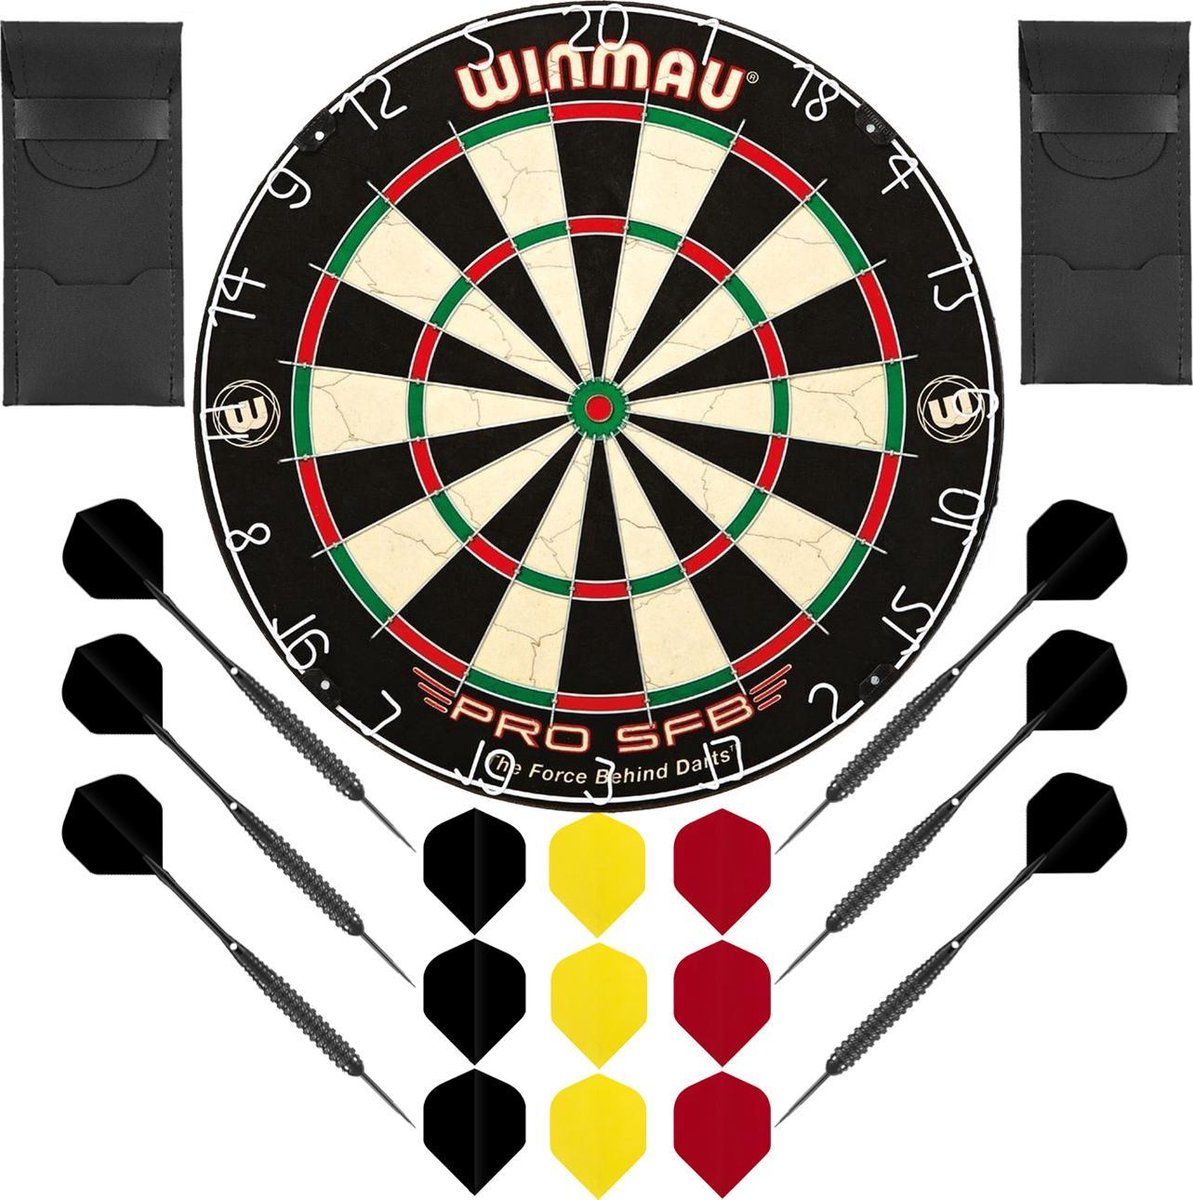 Dragon Darts Belgian Dreammaker set - dartbord - 2 sets - dartpijlen - dart shafts - dart flights - Winmau PRO SFB